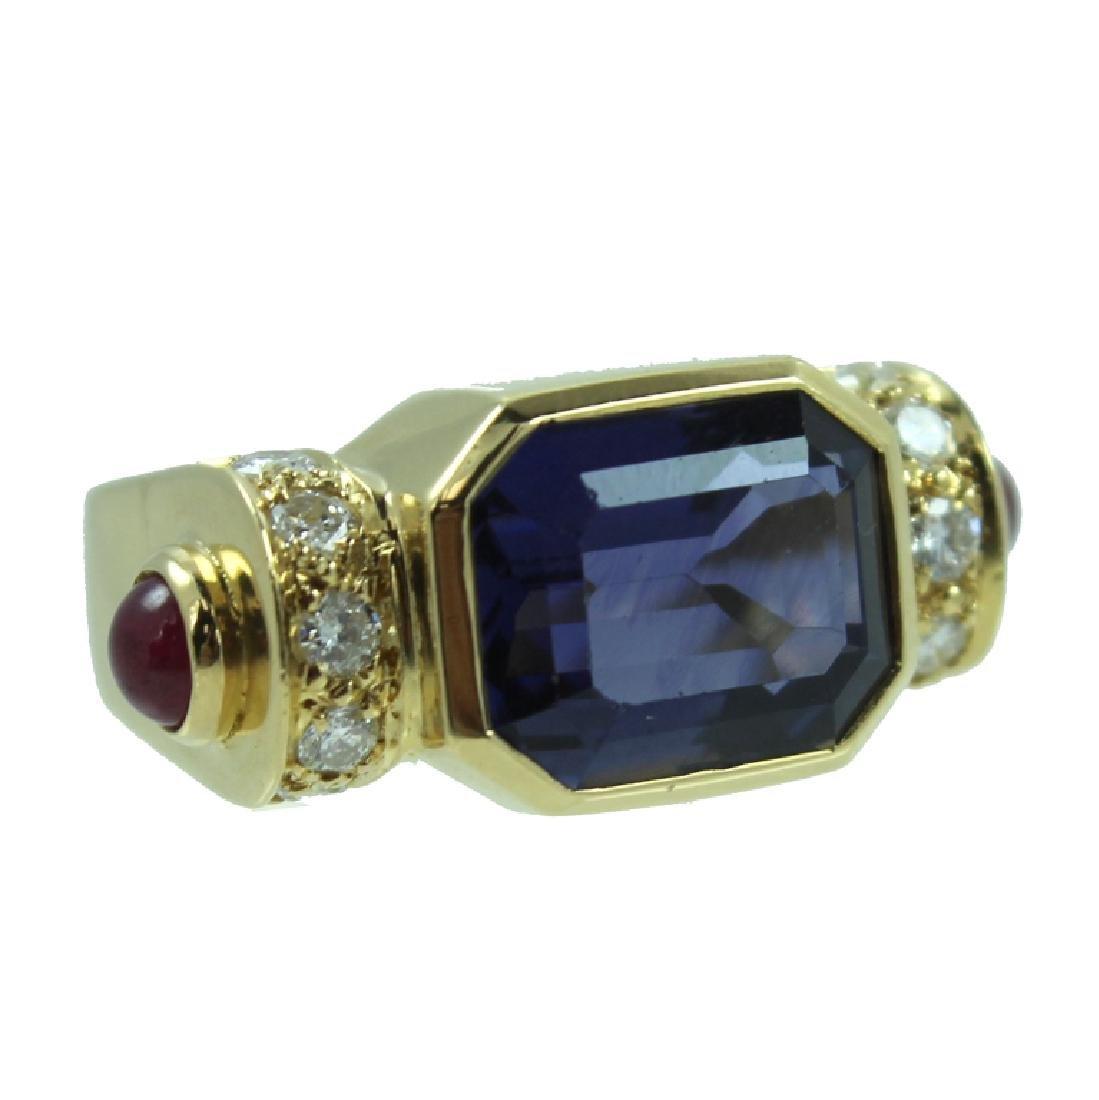 ESTATE LOLITE RUBY & DIAMOND RING